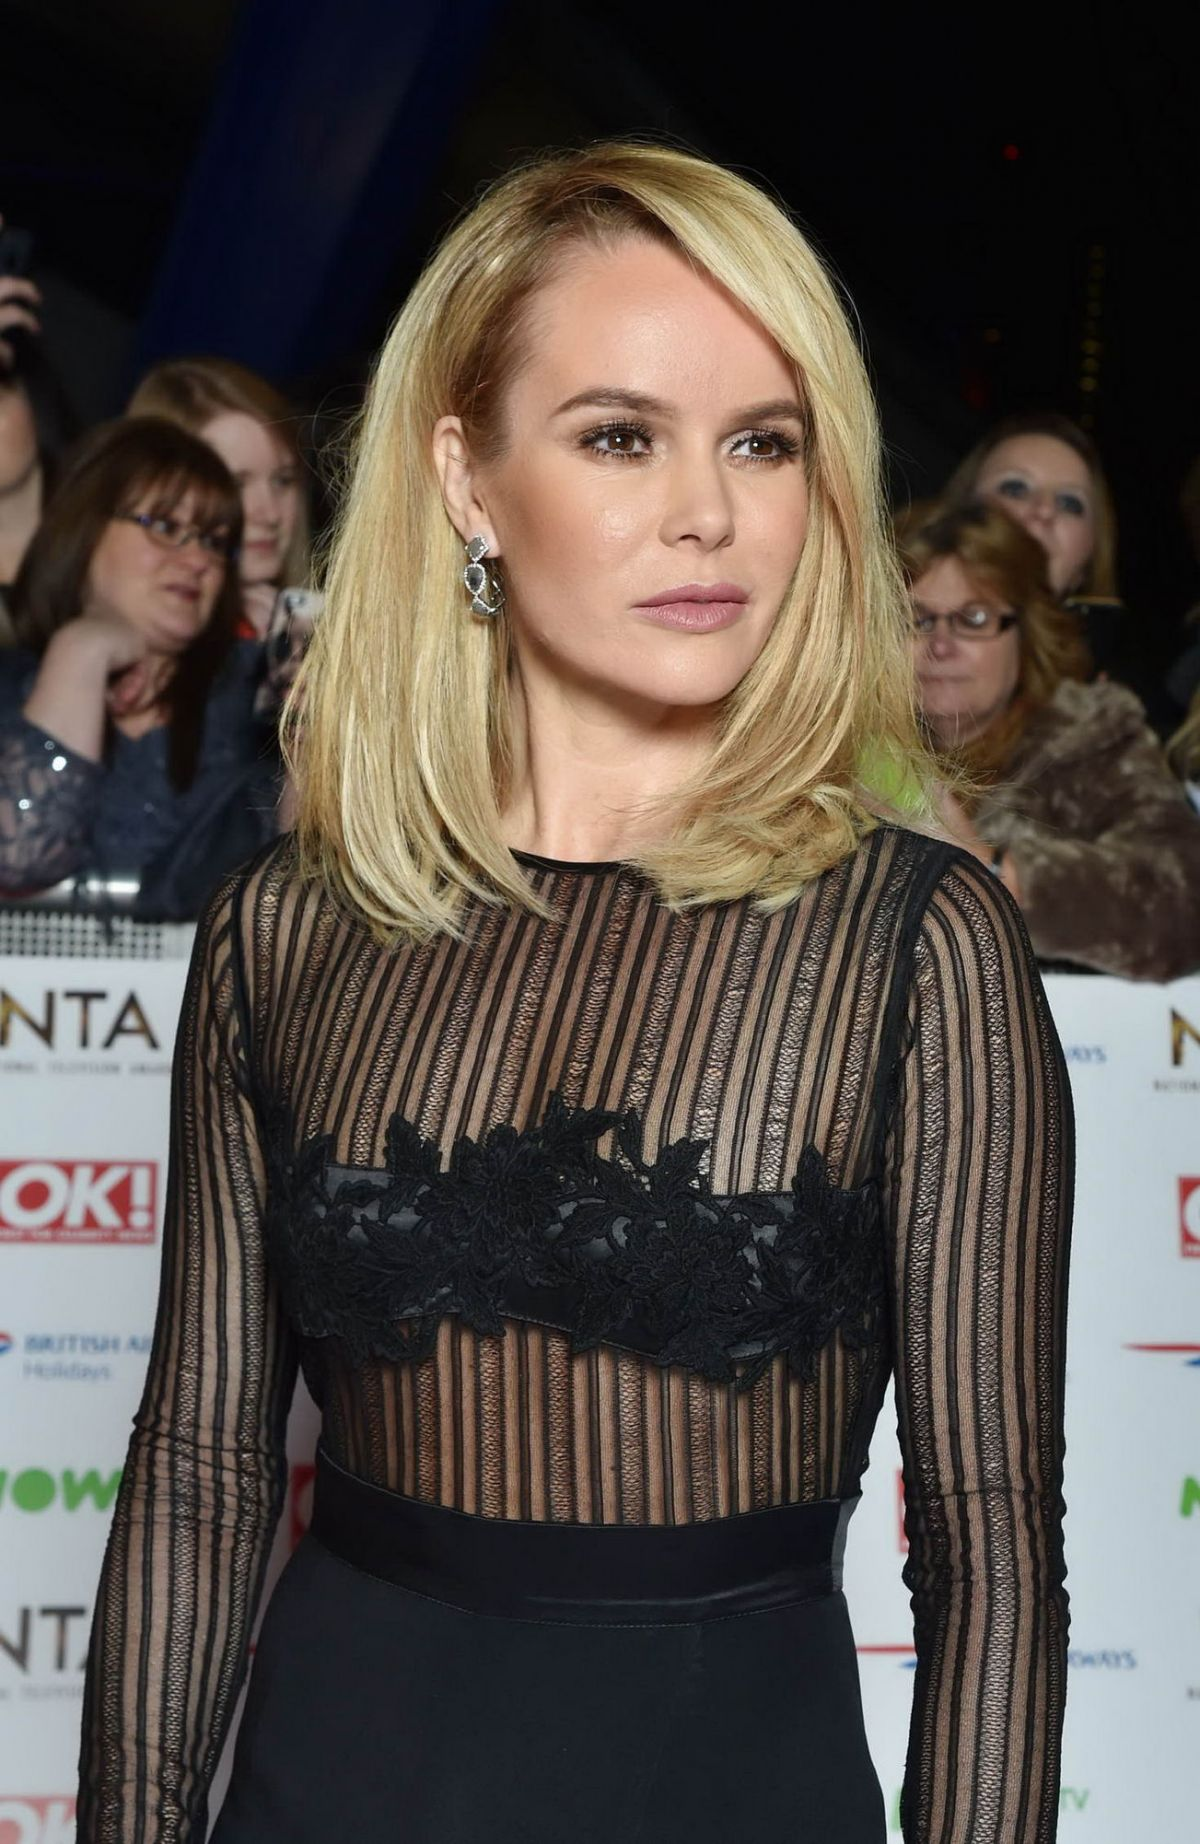 AMANDA HOLDEN at 2016 National Television Awards in London 01/20/2016